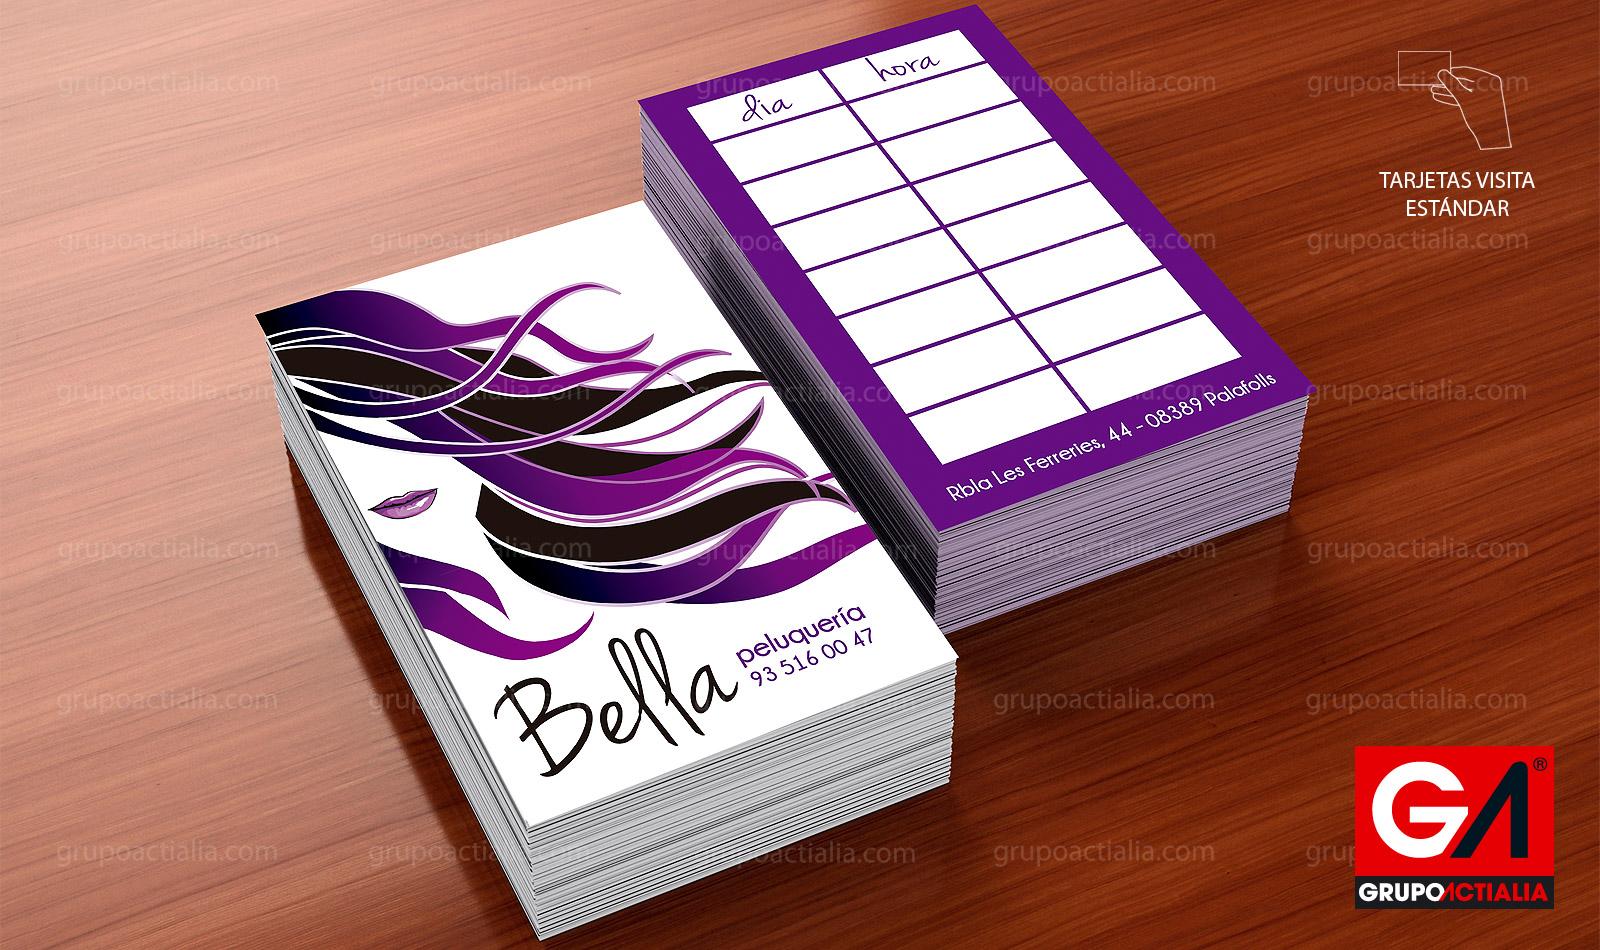 Desde 35 tarjetas visita est ndar dise o gr fico - Disenos para tarjetas ...